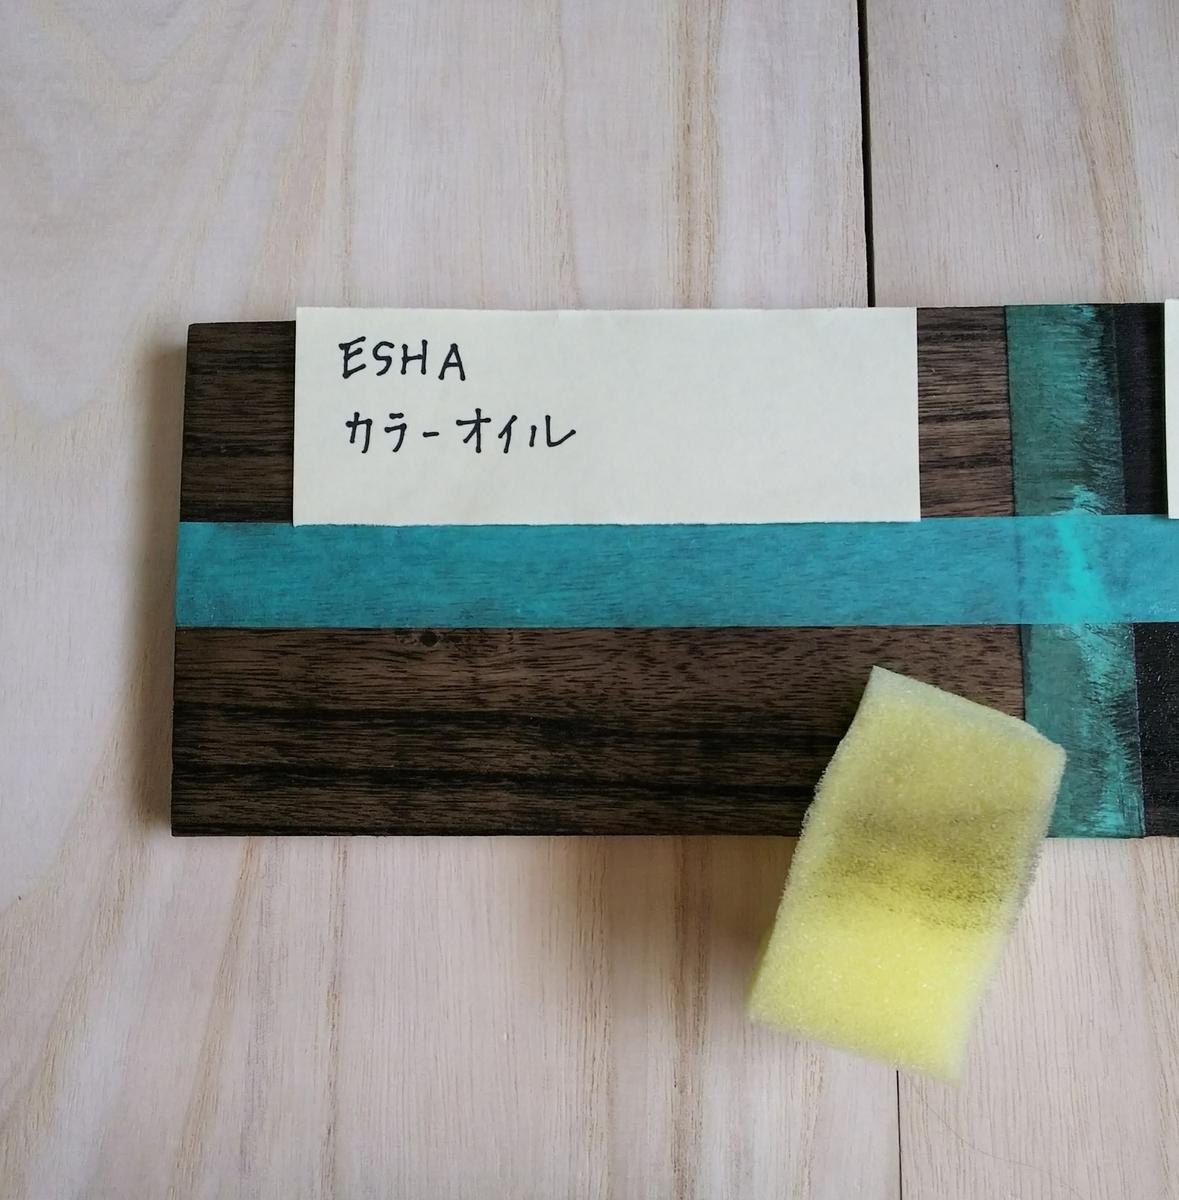 f:id:natsumikandiy:20200914213640j:plain